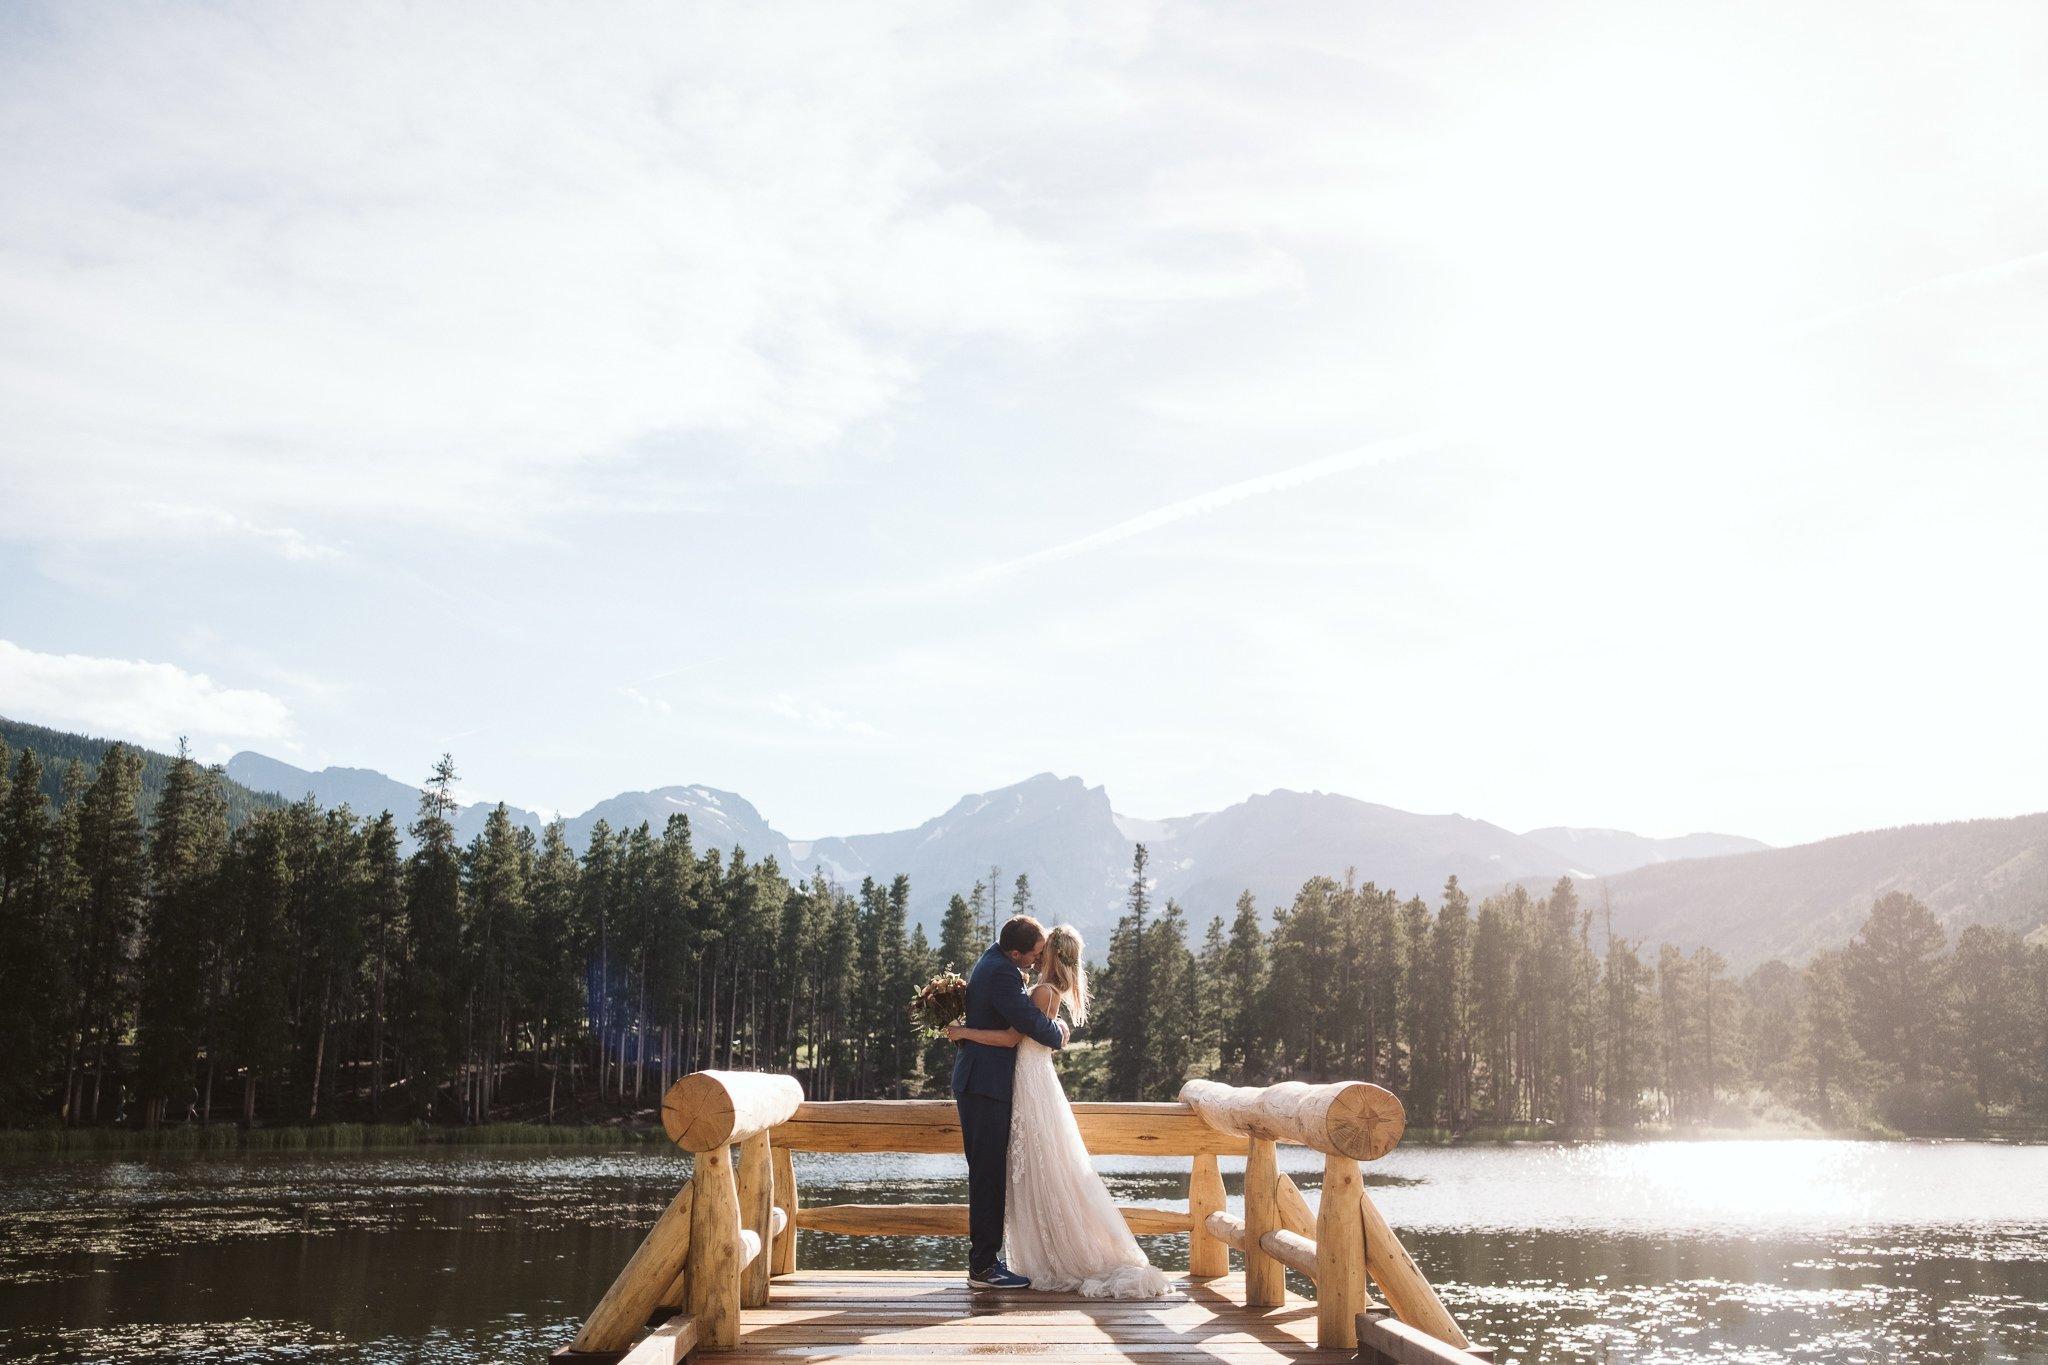 Sprague Lake elopement photos in Rocky Mountain National Park, Colorado elopement photographer